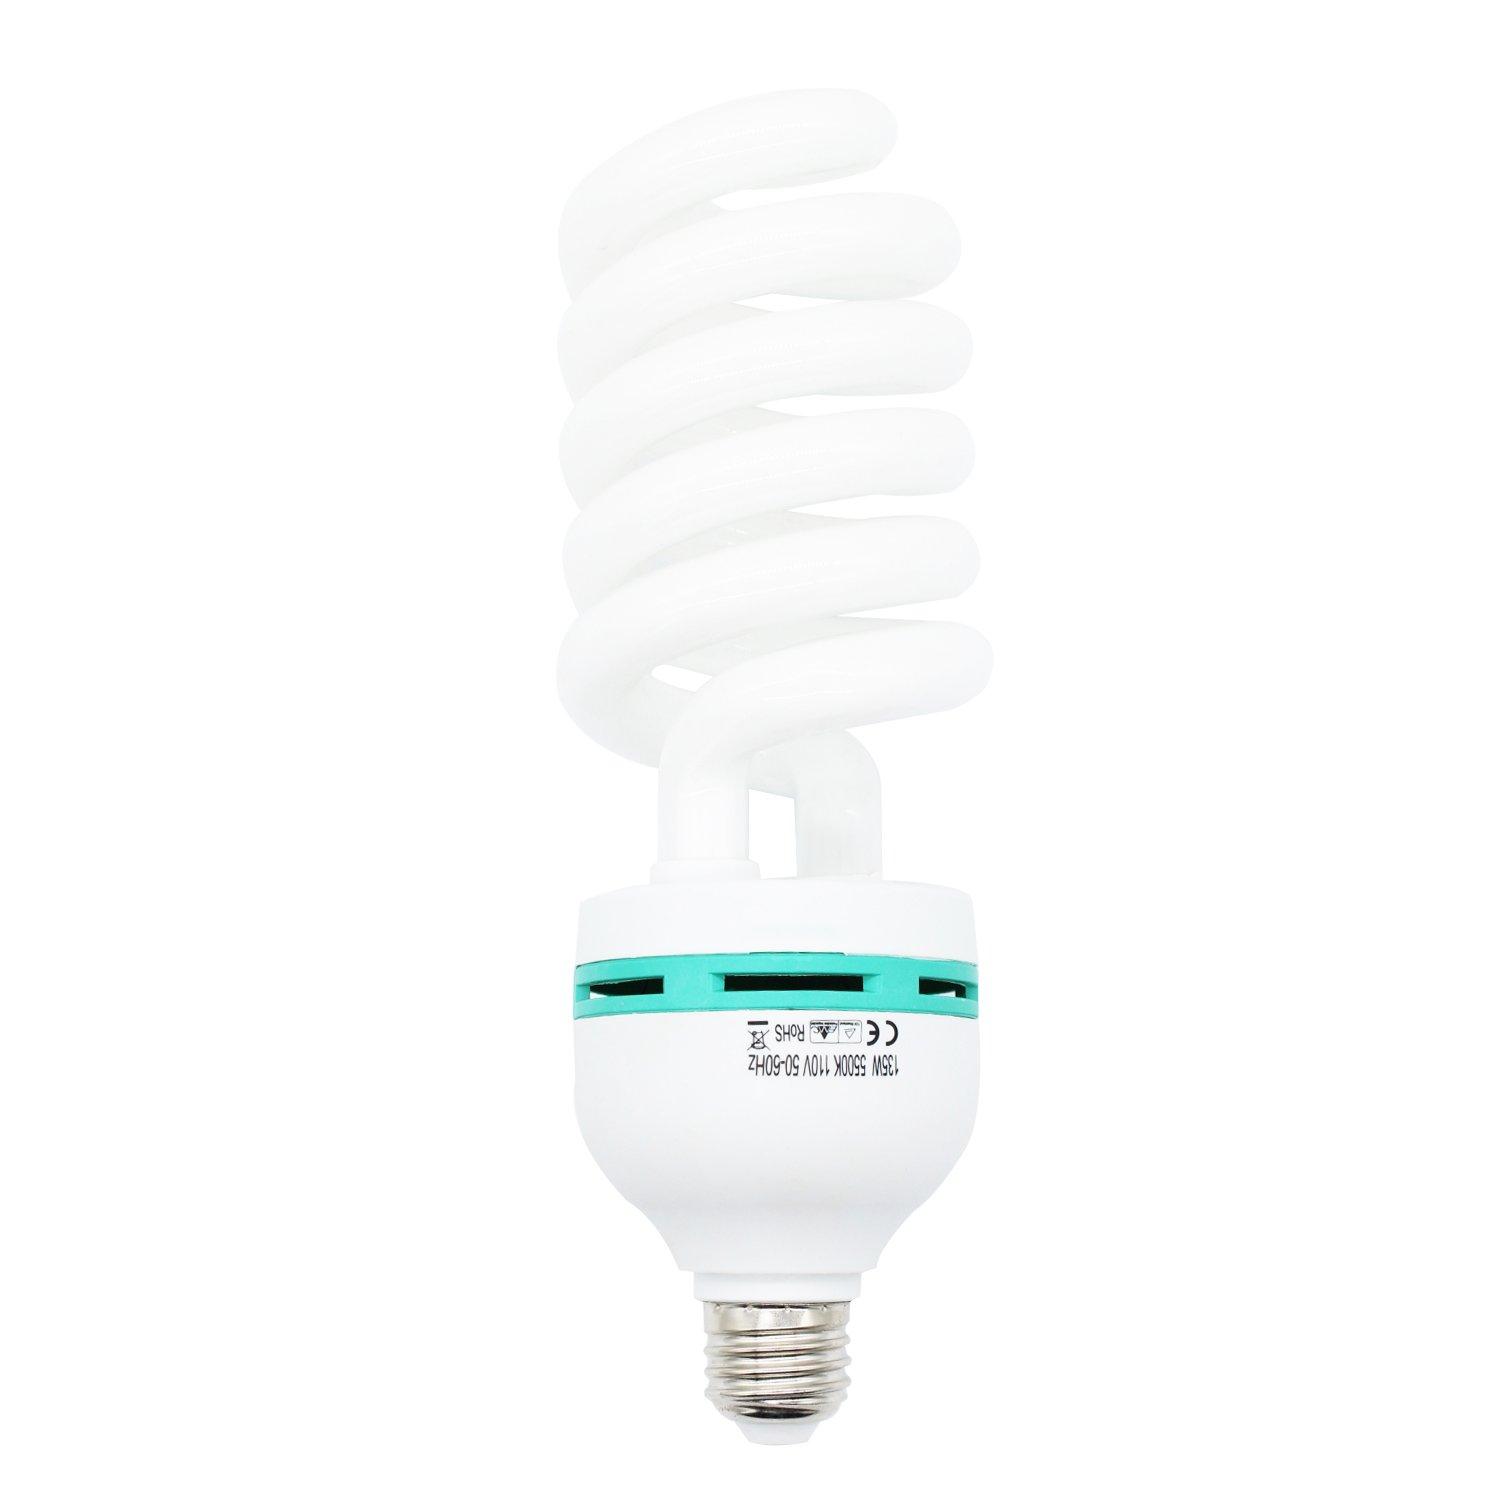 Foto&Tech 135 Watt Daylight Photography Fluorescent Spiral Light Bulb 5500K 110V White for Photography and Video Studio Lighting (1 Pack)